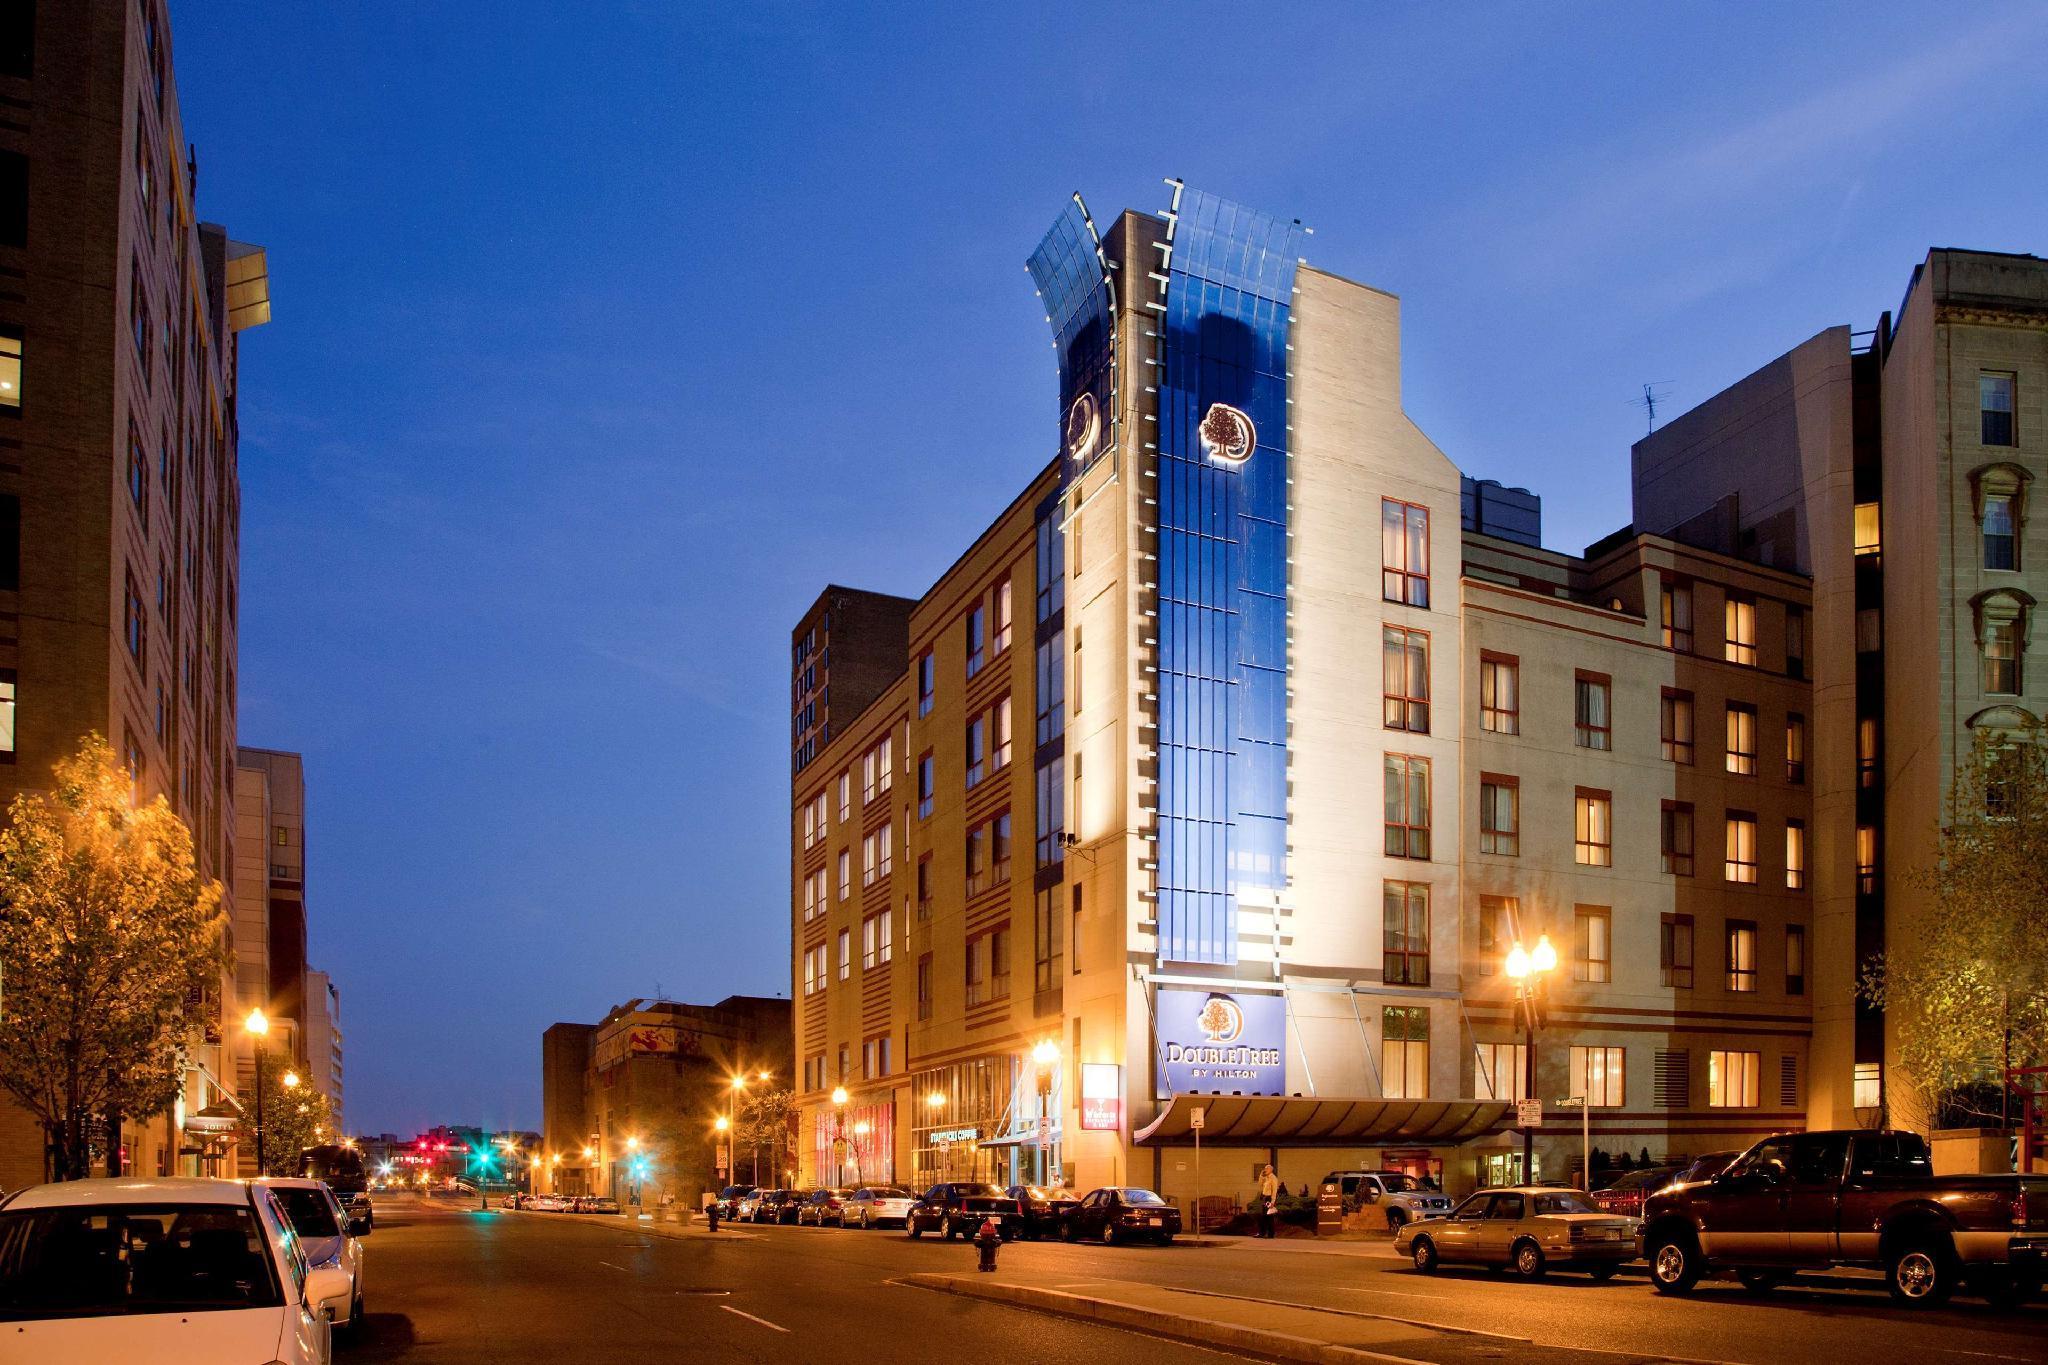 DoubleTree by Hilton Hotel Boston-Downtown